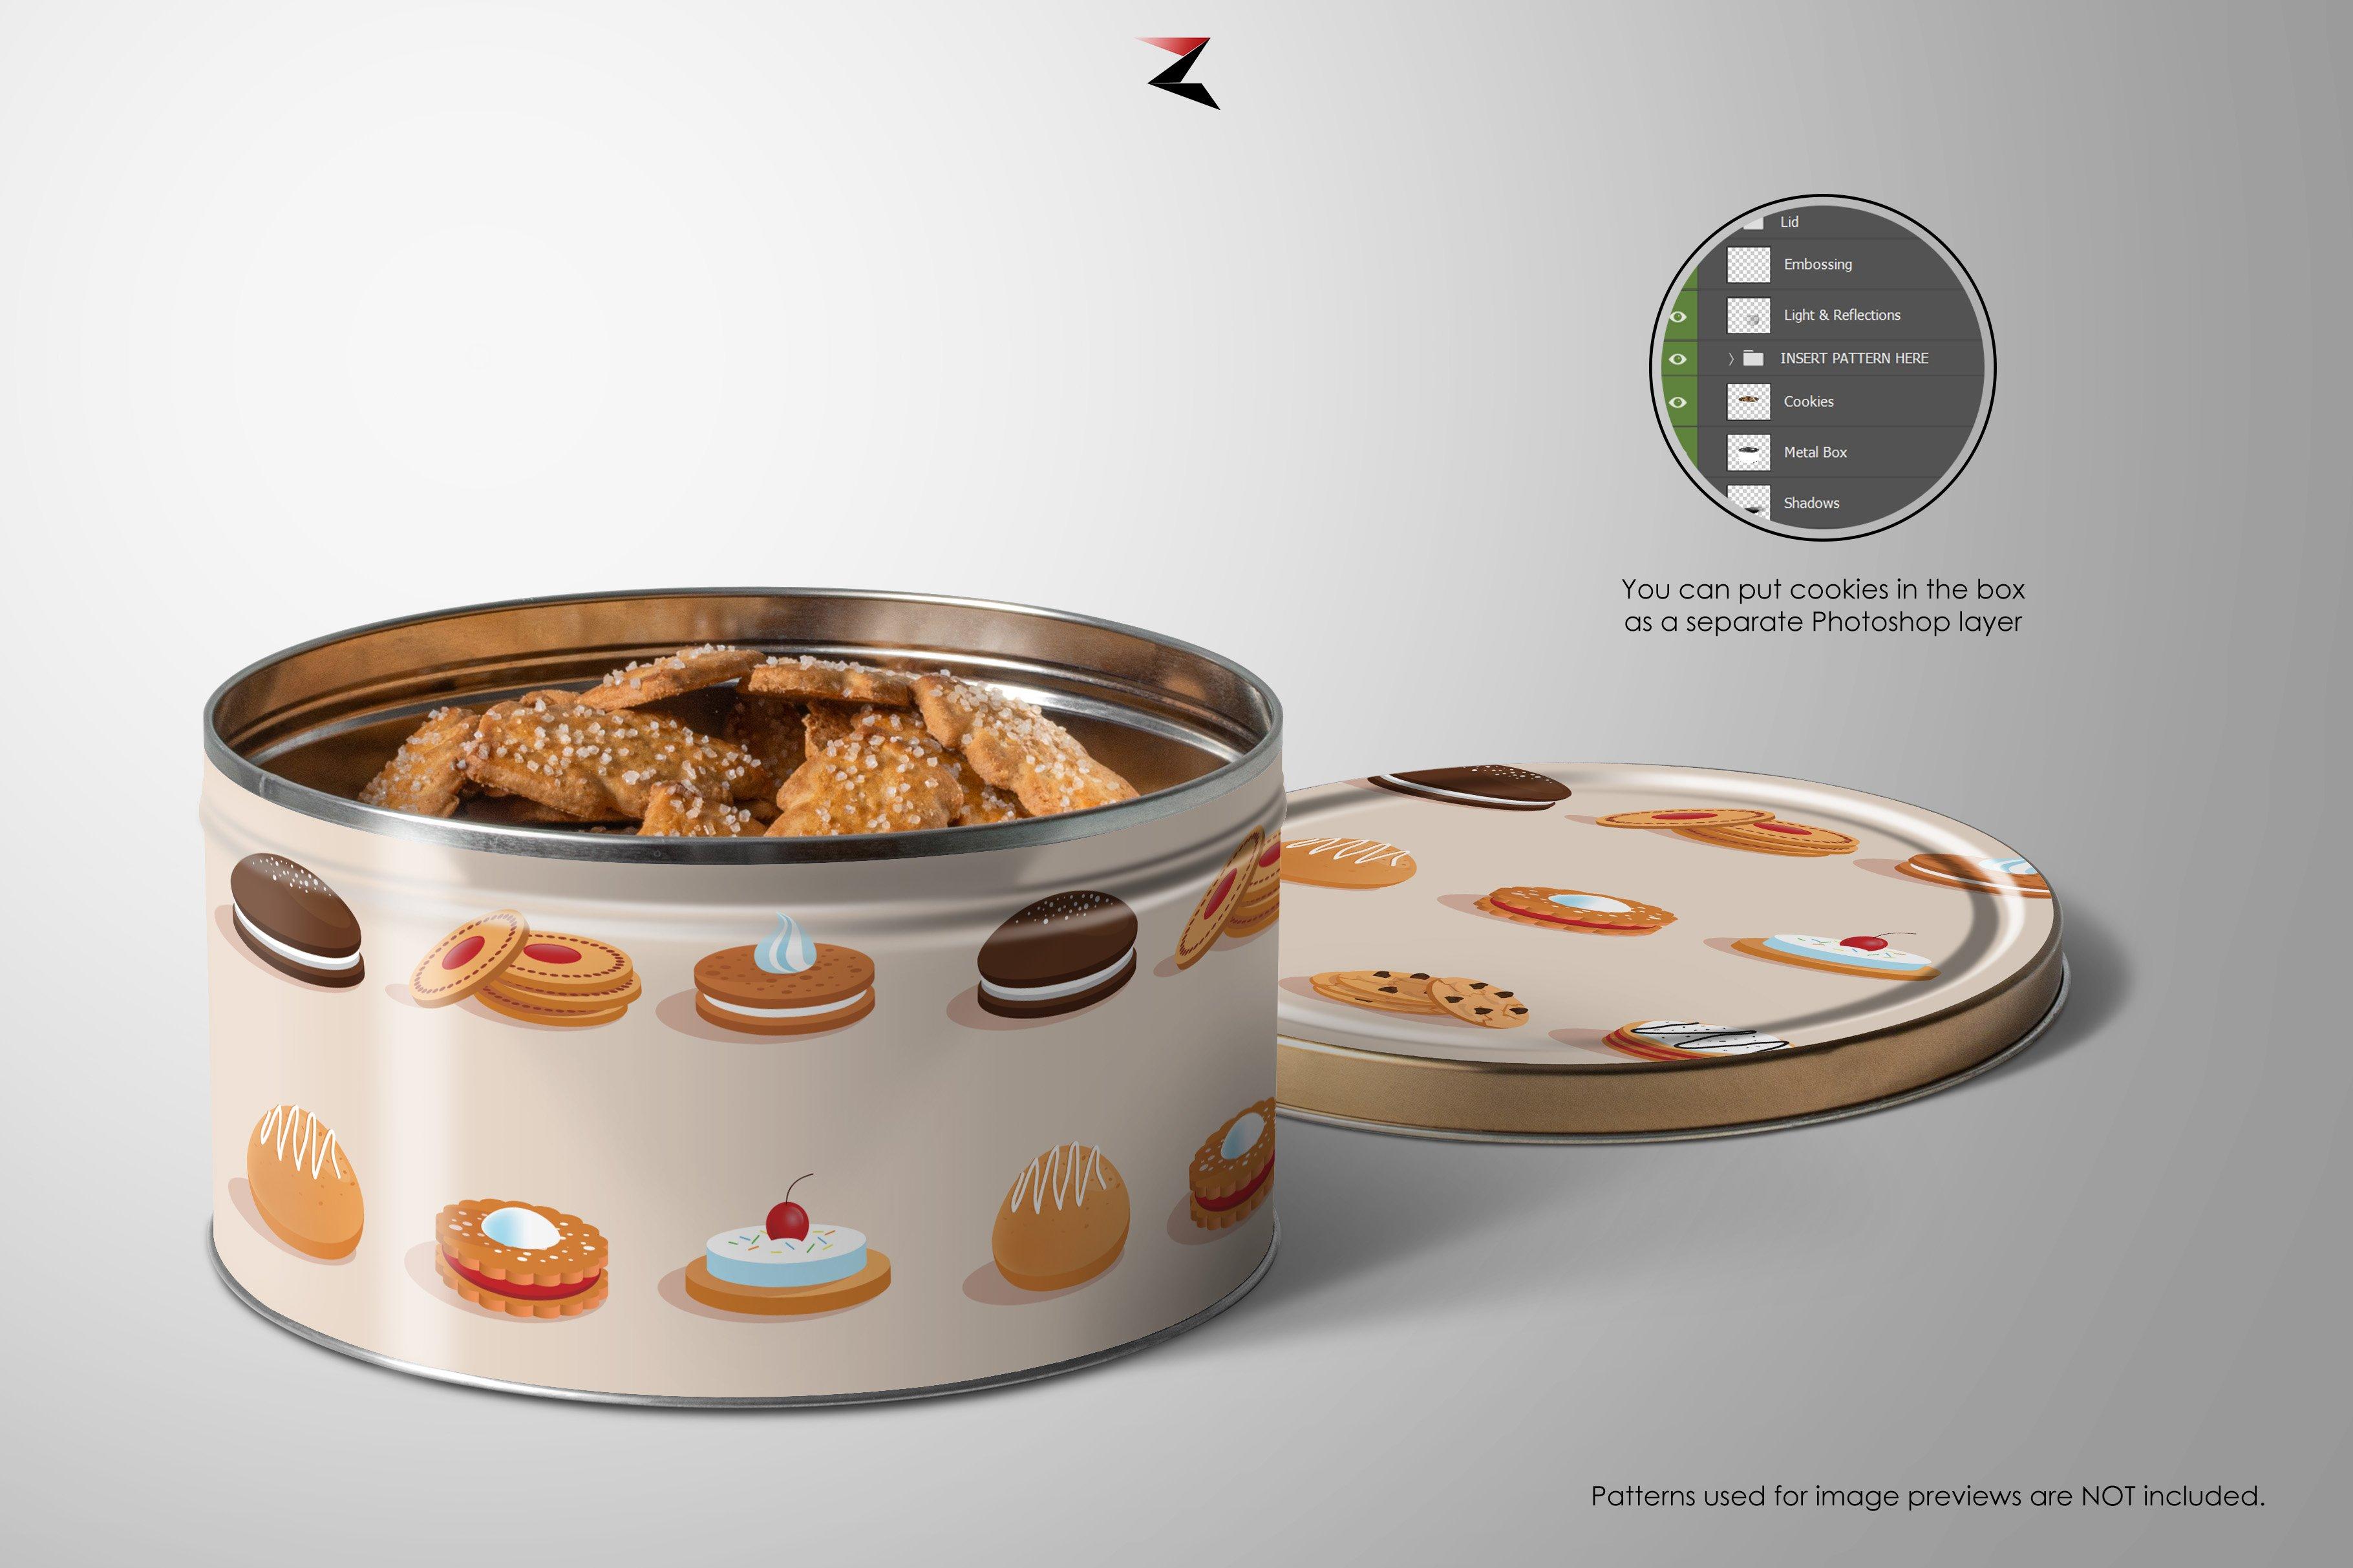 6K高清产品金属贴合外观设计展示样机 Metal Box Mockup 6K插图2